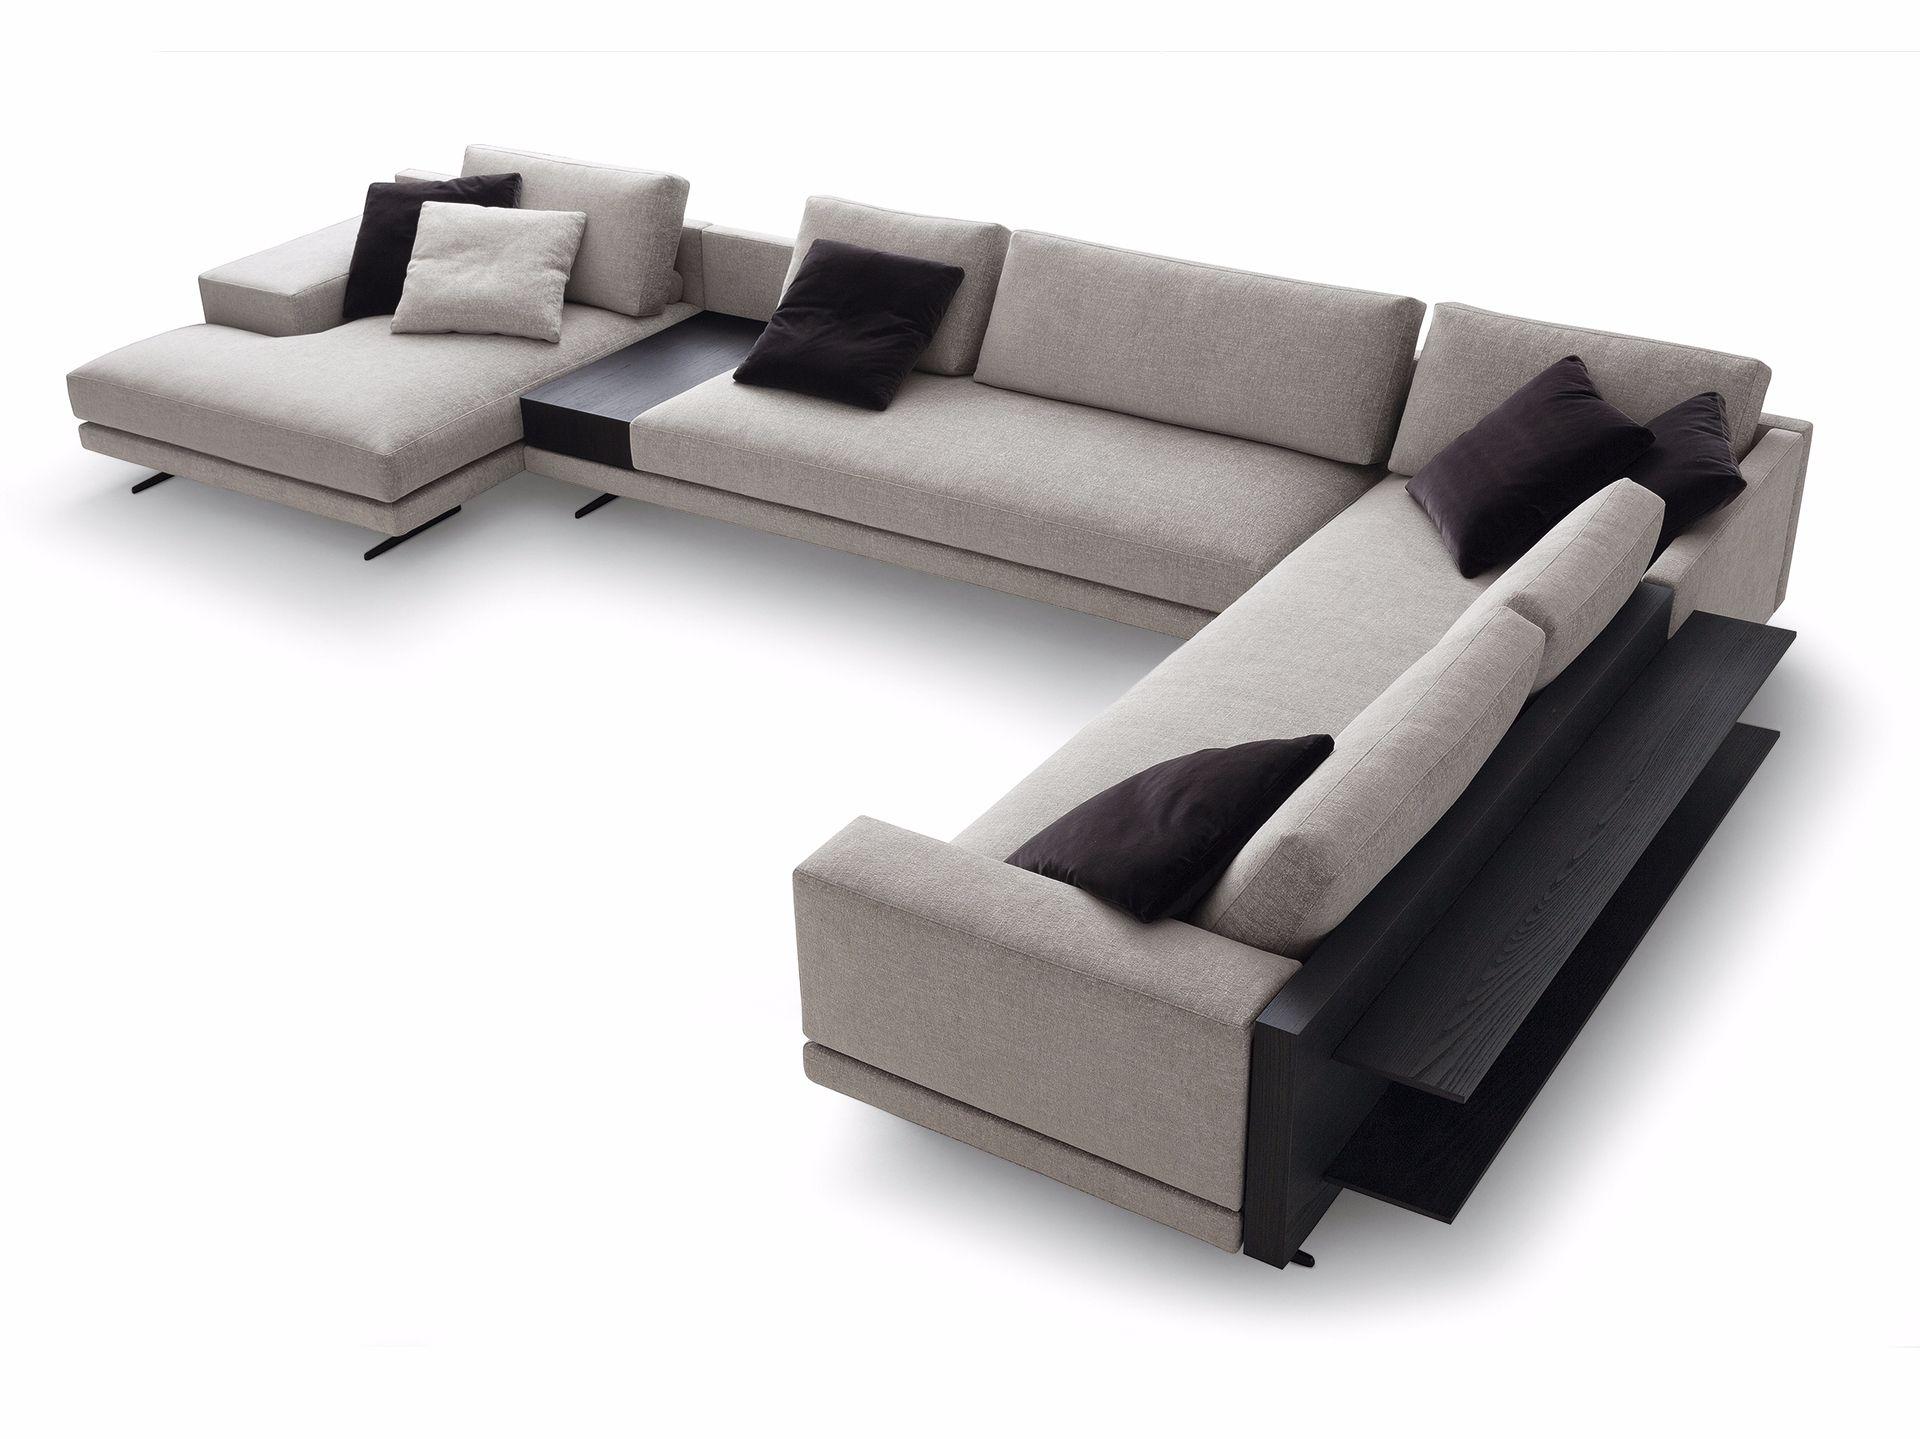 MONDRIAN Corner sofa Mondrian Collection by Poliform design Jean